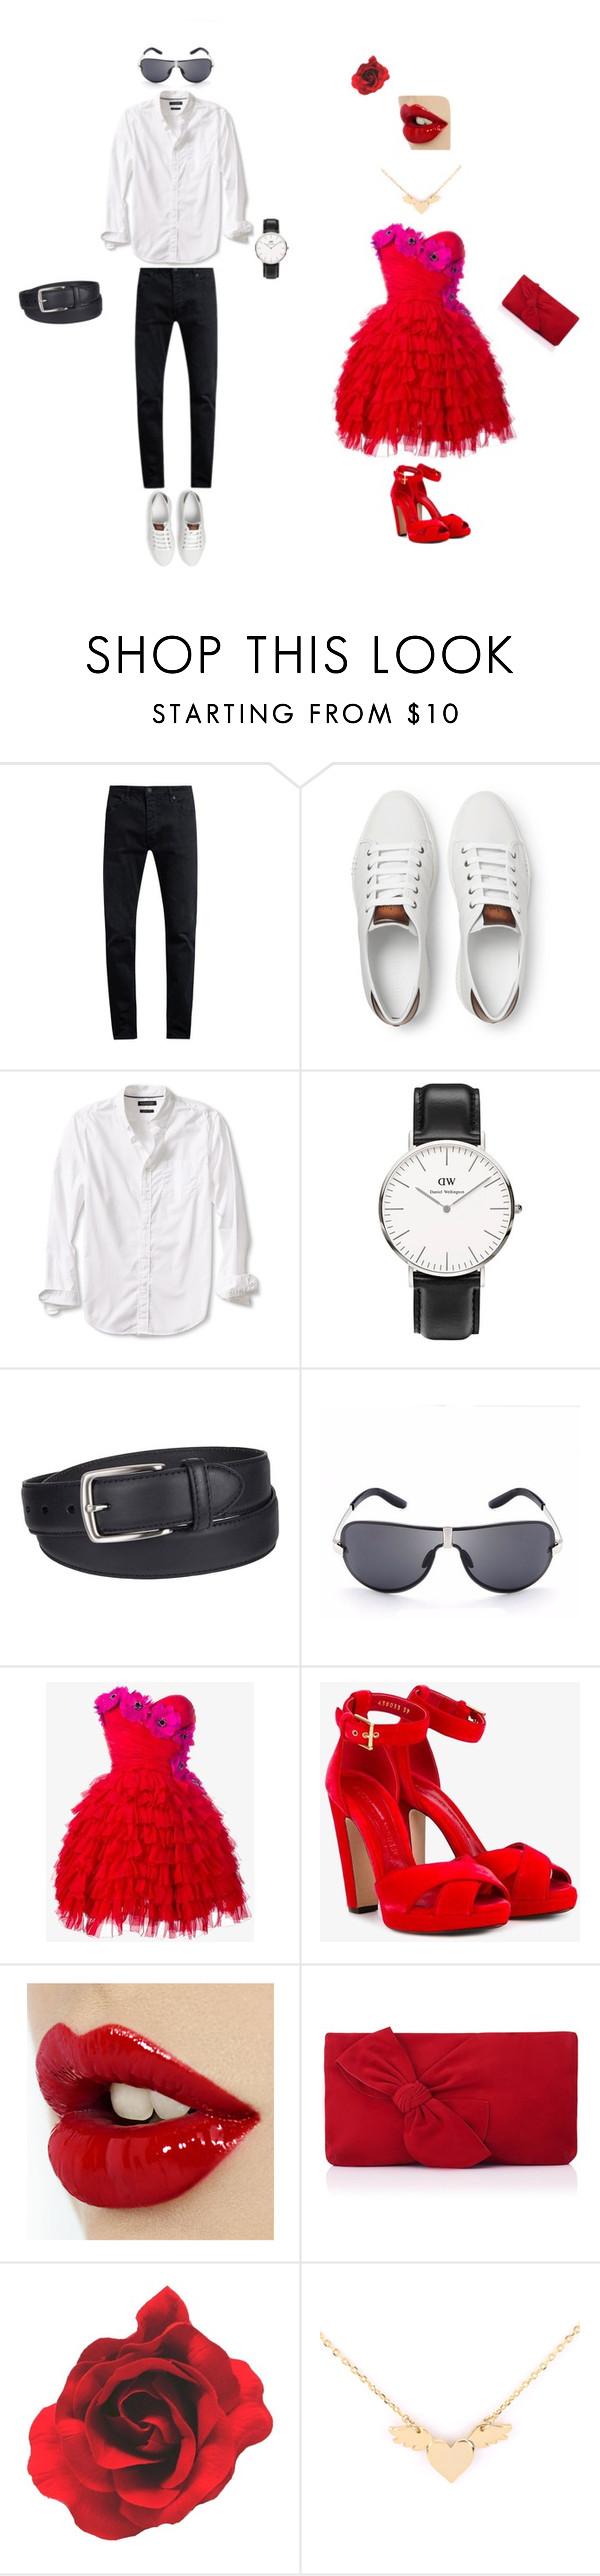 """Fashion"" by elena-908 on Polyvore featuring Neuw denim, Berluti, Banana Republic, Daniel Wellington, Columbia, Dolce&Gabbana, Alexander McQueen and L.K.Bennett"